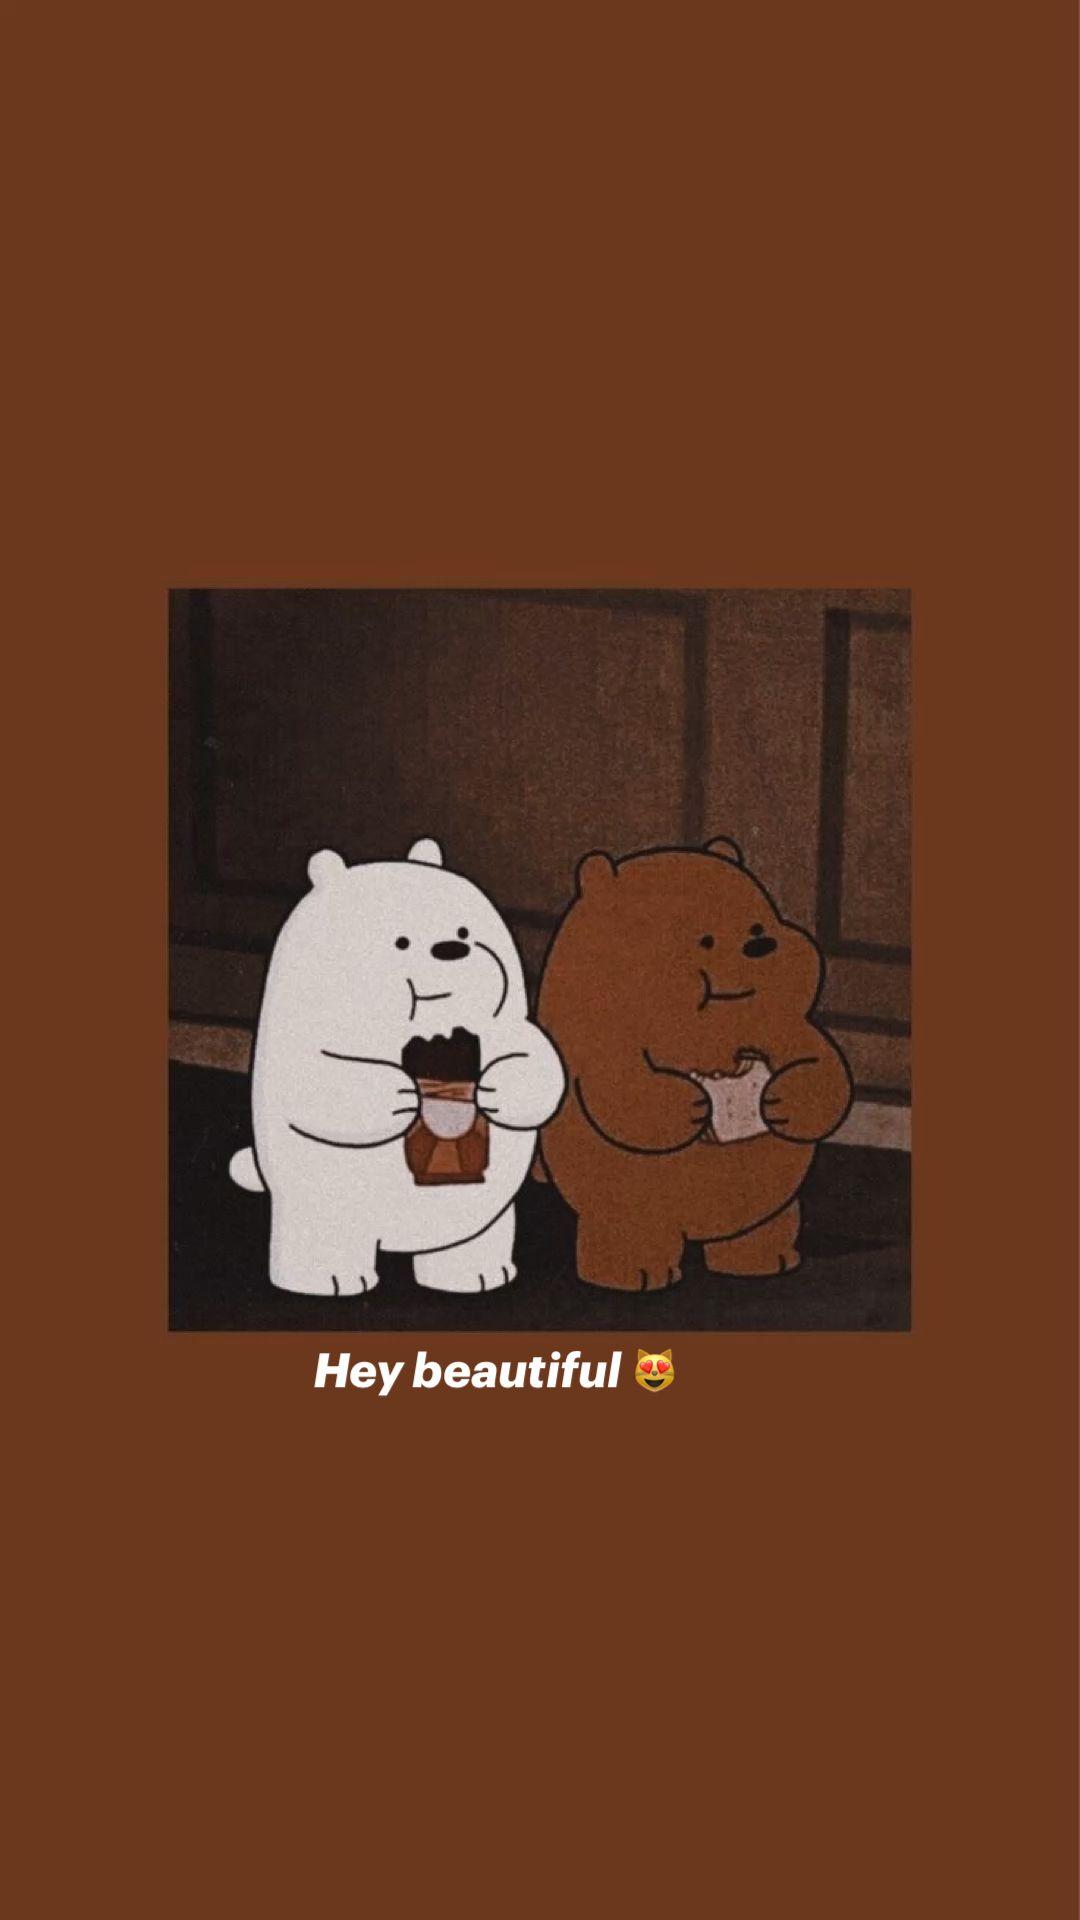 Hey beautiful 😻